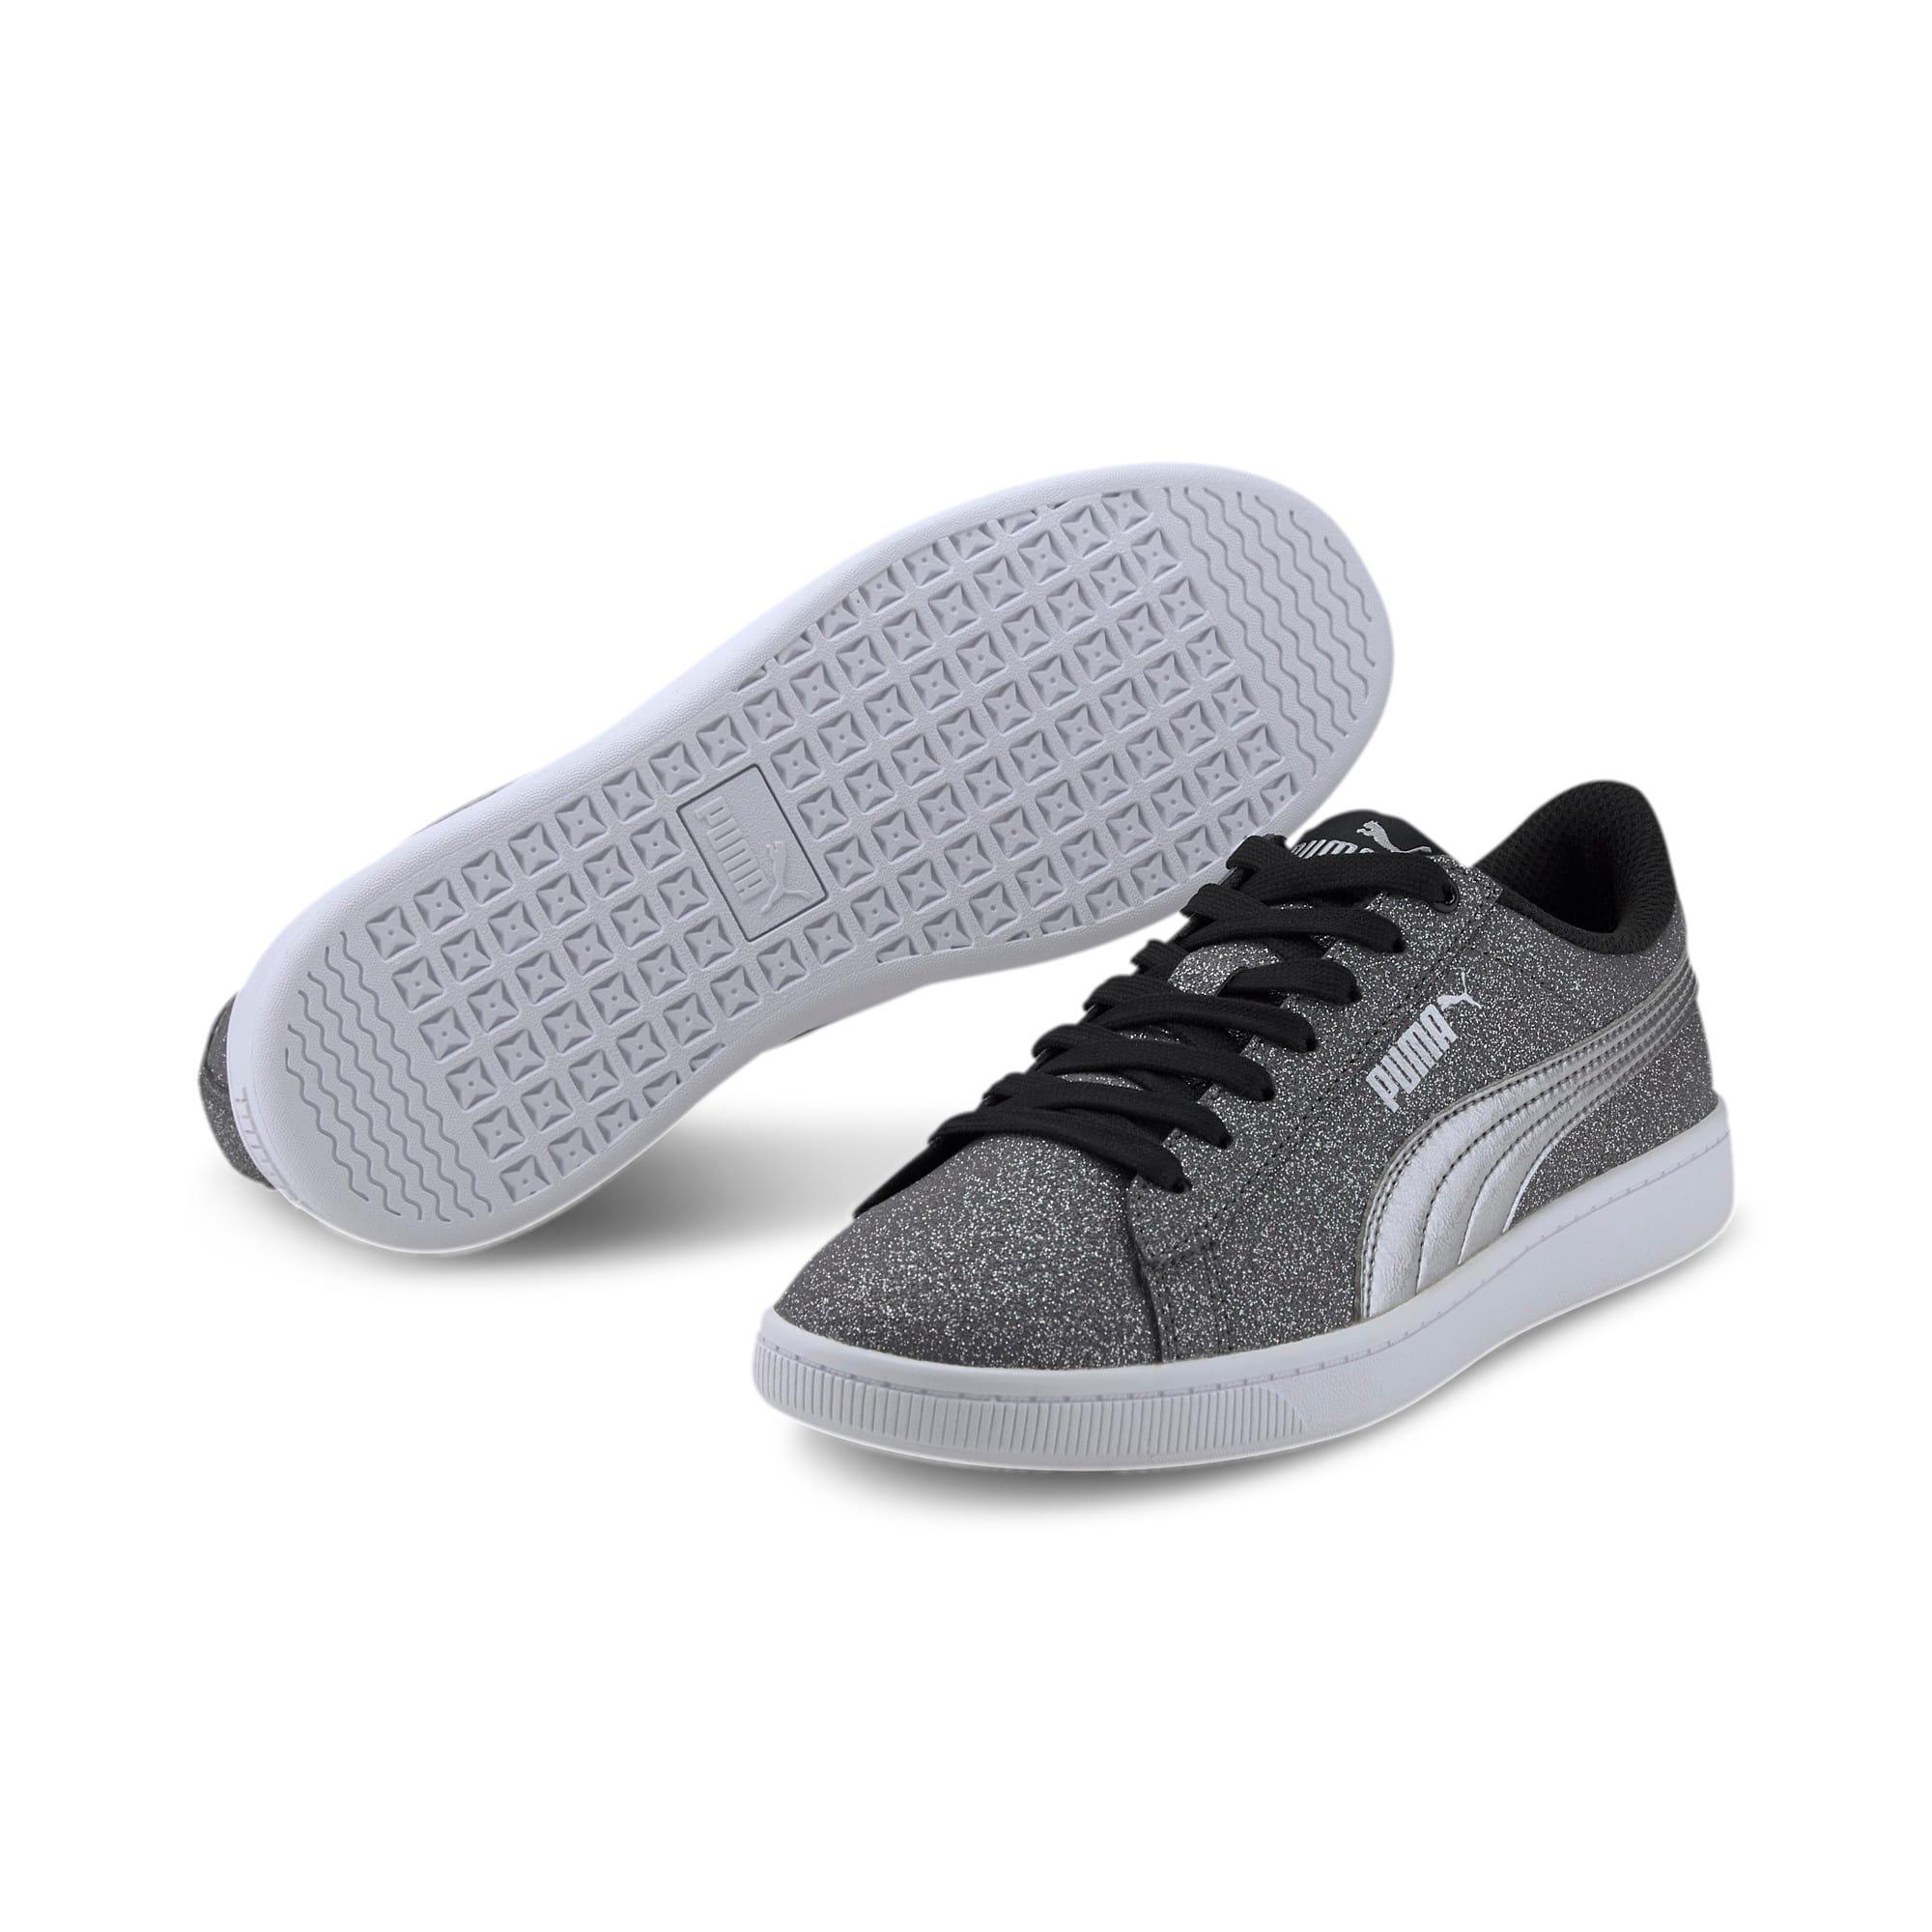 Thumbnail 2 of PUMA Vikky v2 Glitz Sneakers JR, Puma Black-Puma Silver-White, medium